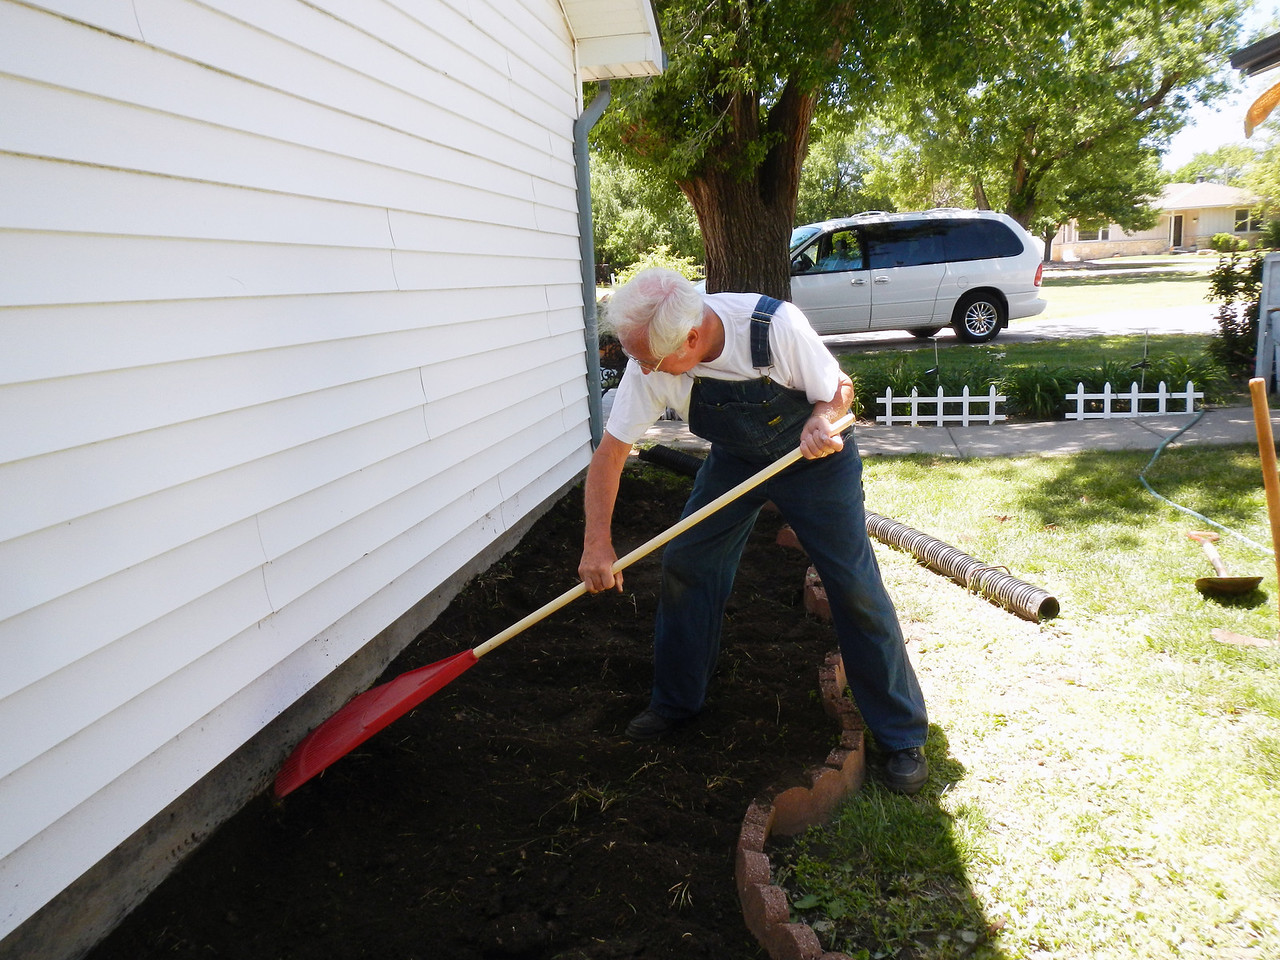 Farmer Gary is working the soil with his favorite rake.  (taken 6-2-13)